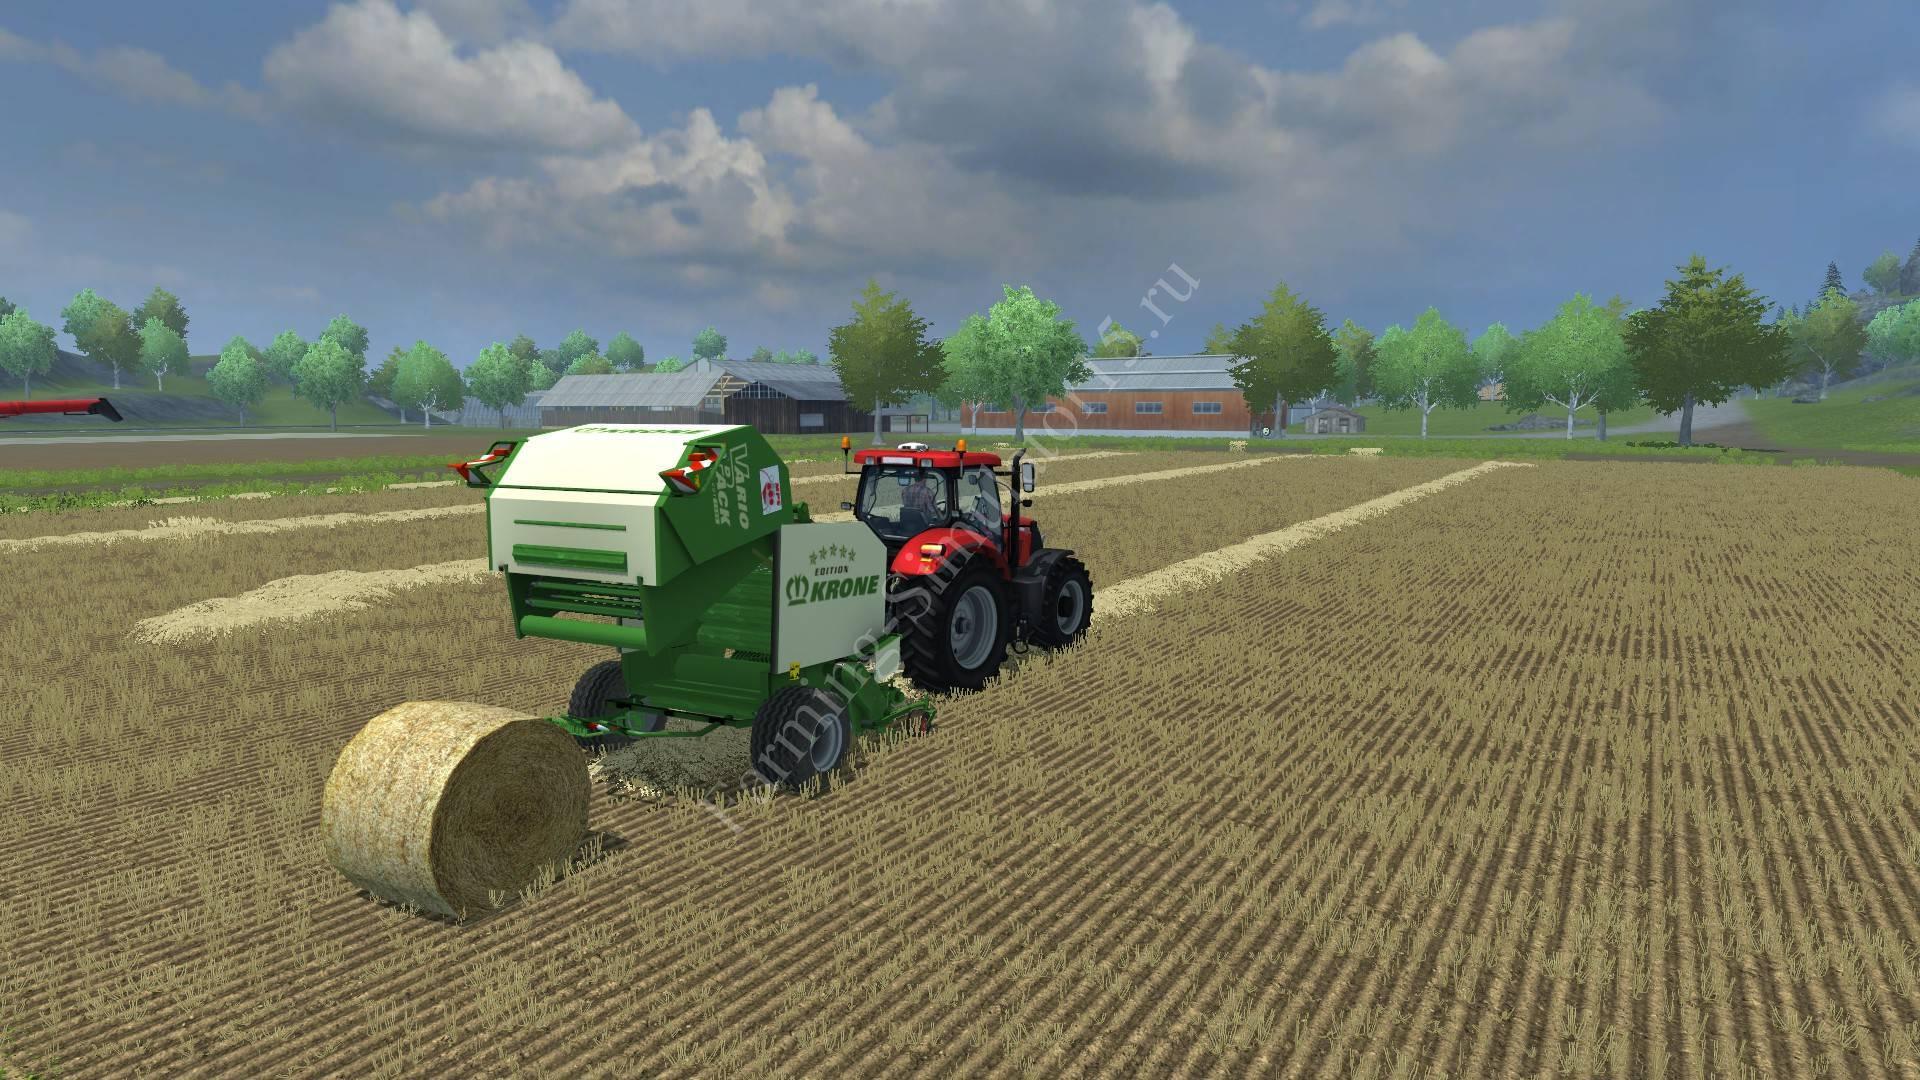 Мод тюкопресса Krone Vario Pack 1200 v 1.0 Farming Simulator 2013, Farming Simulator 13